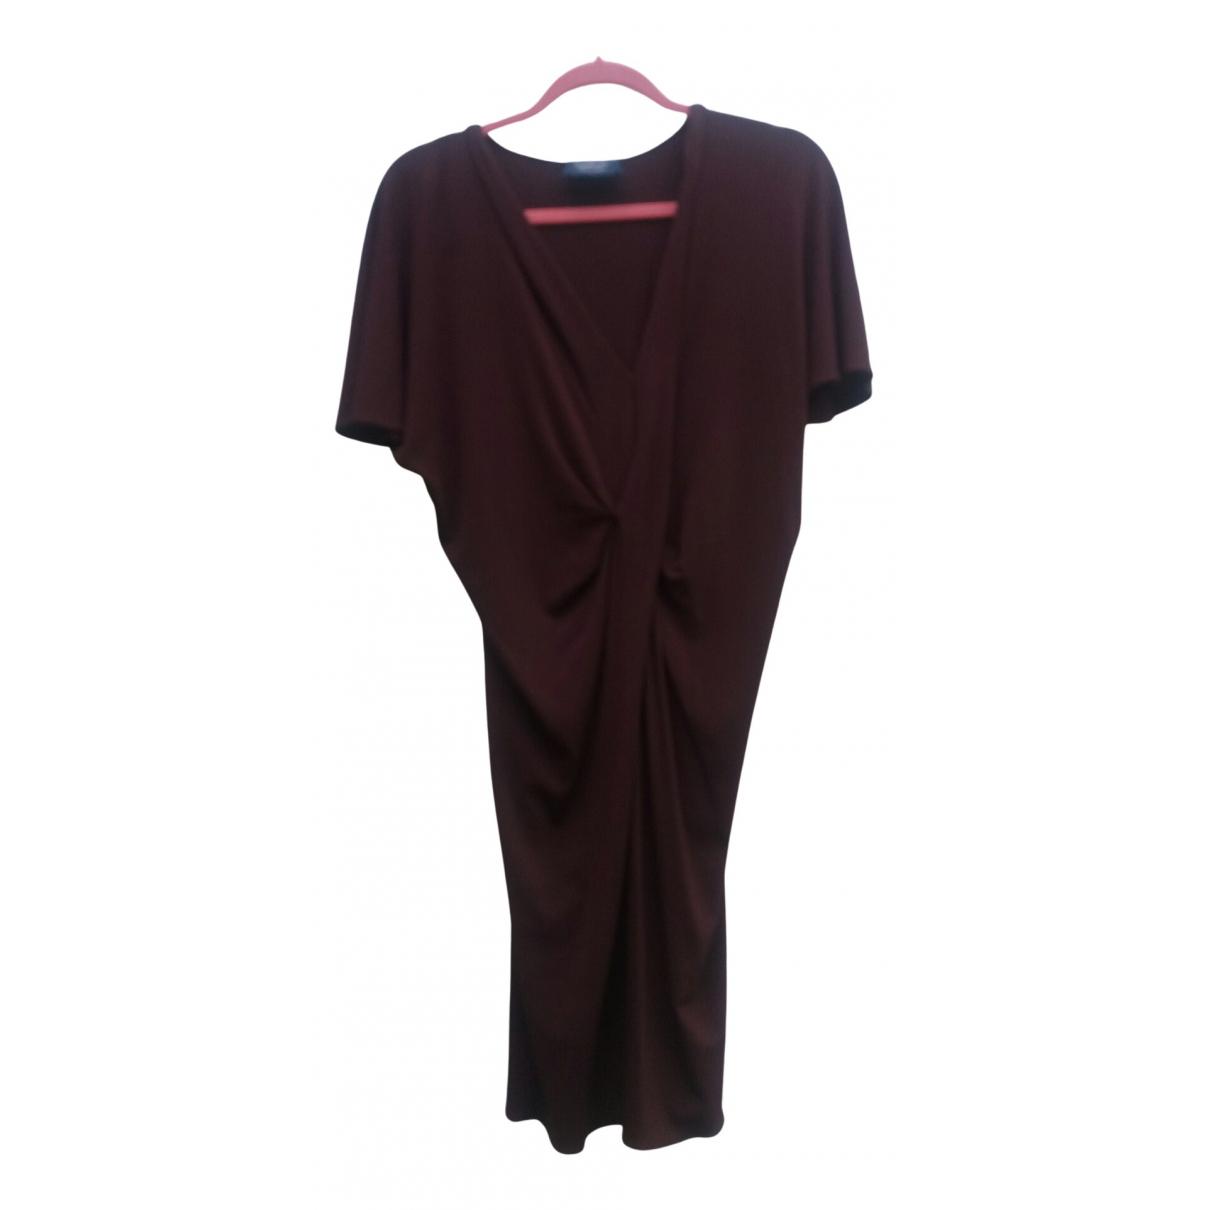 Lanvin \N Kleid in  Braun Viskose